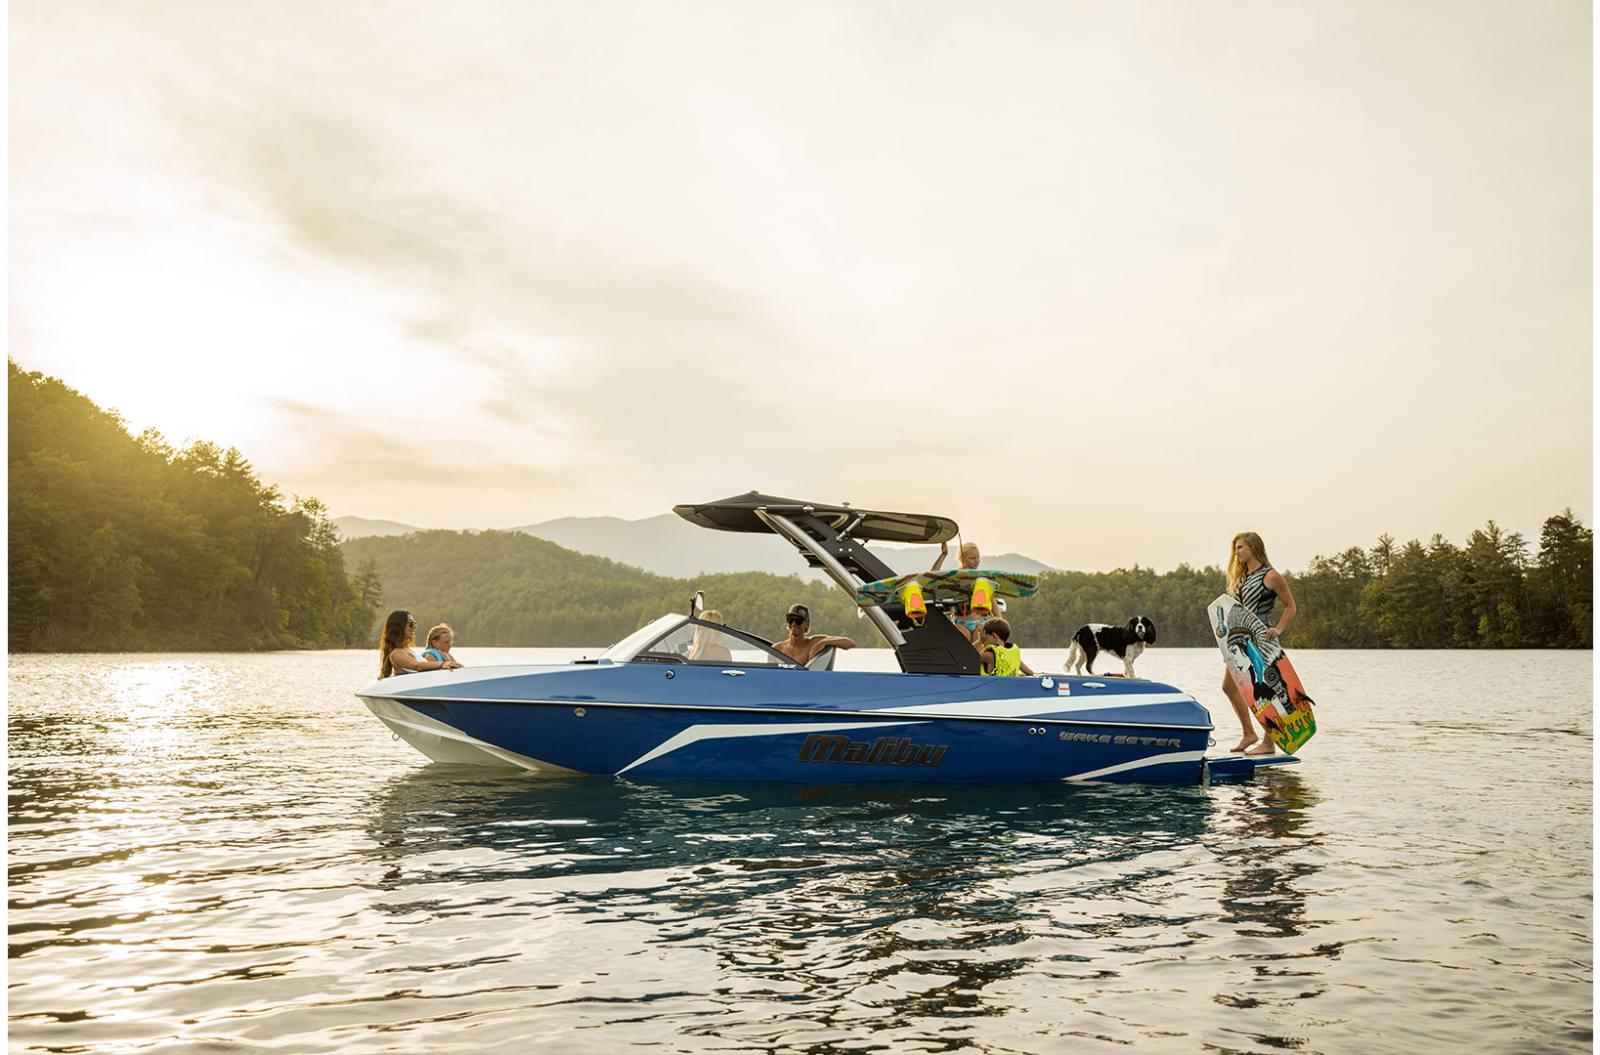 Inventory from Malibu Boats LLC, Fantasy, Formula and Axis